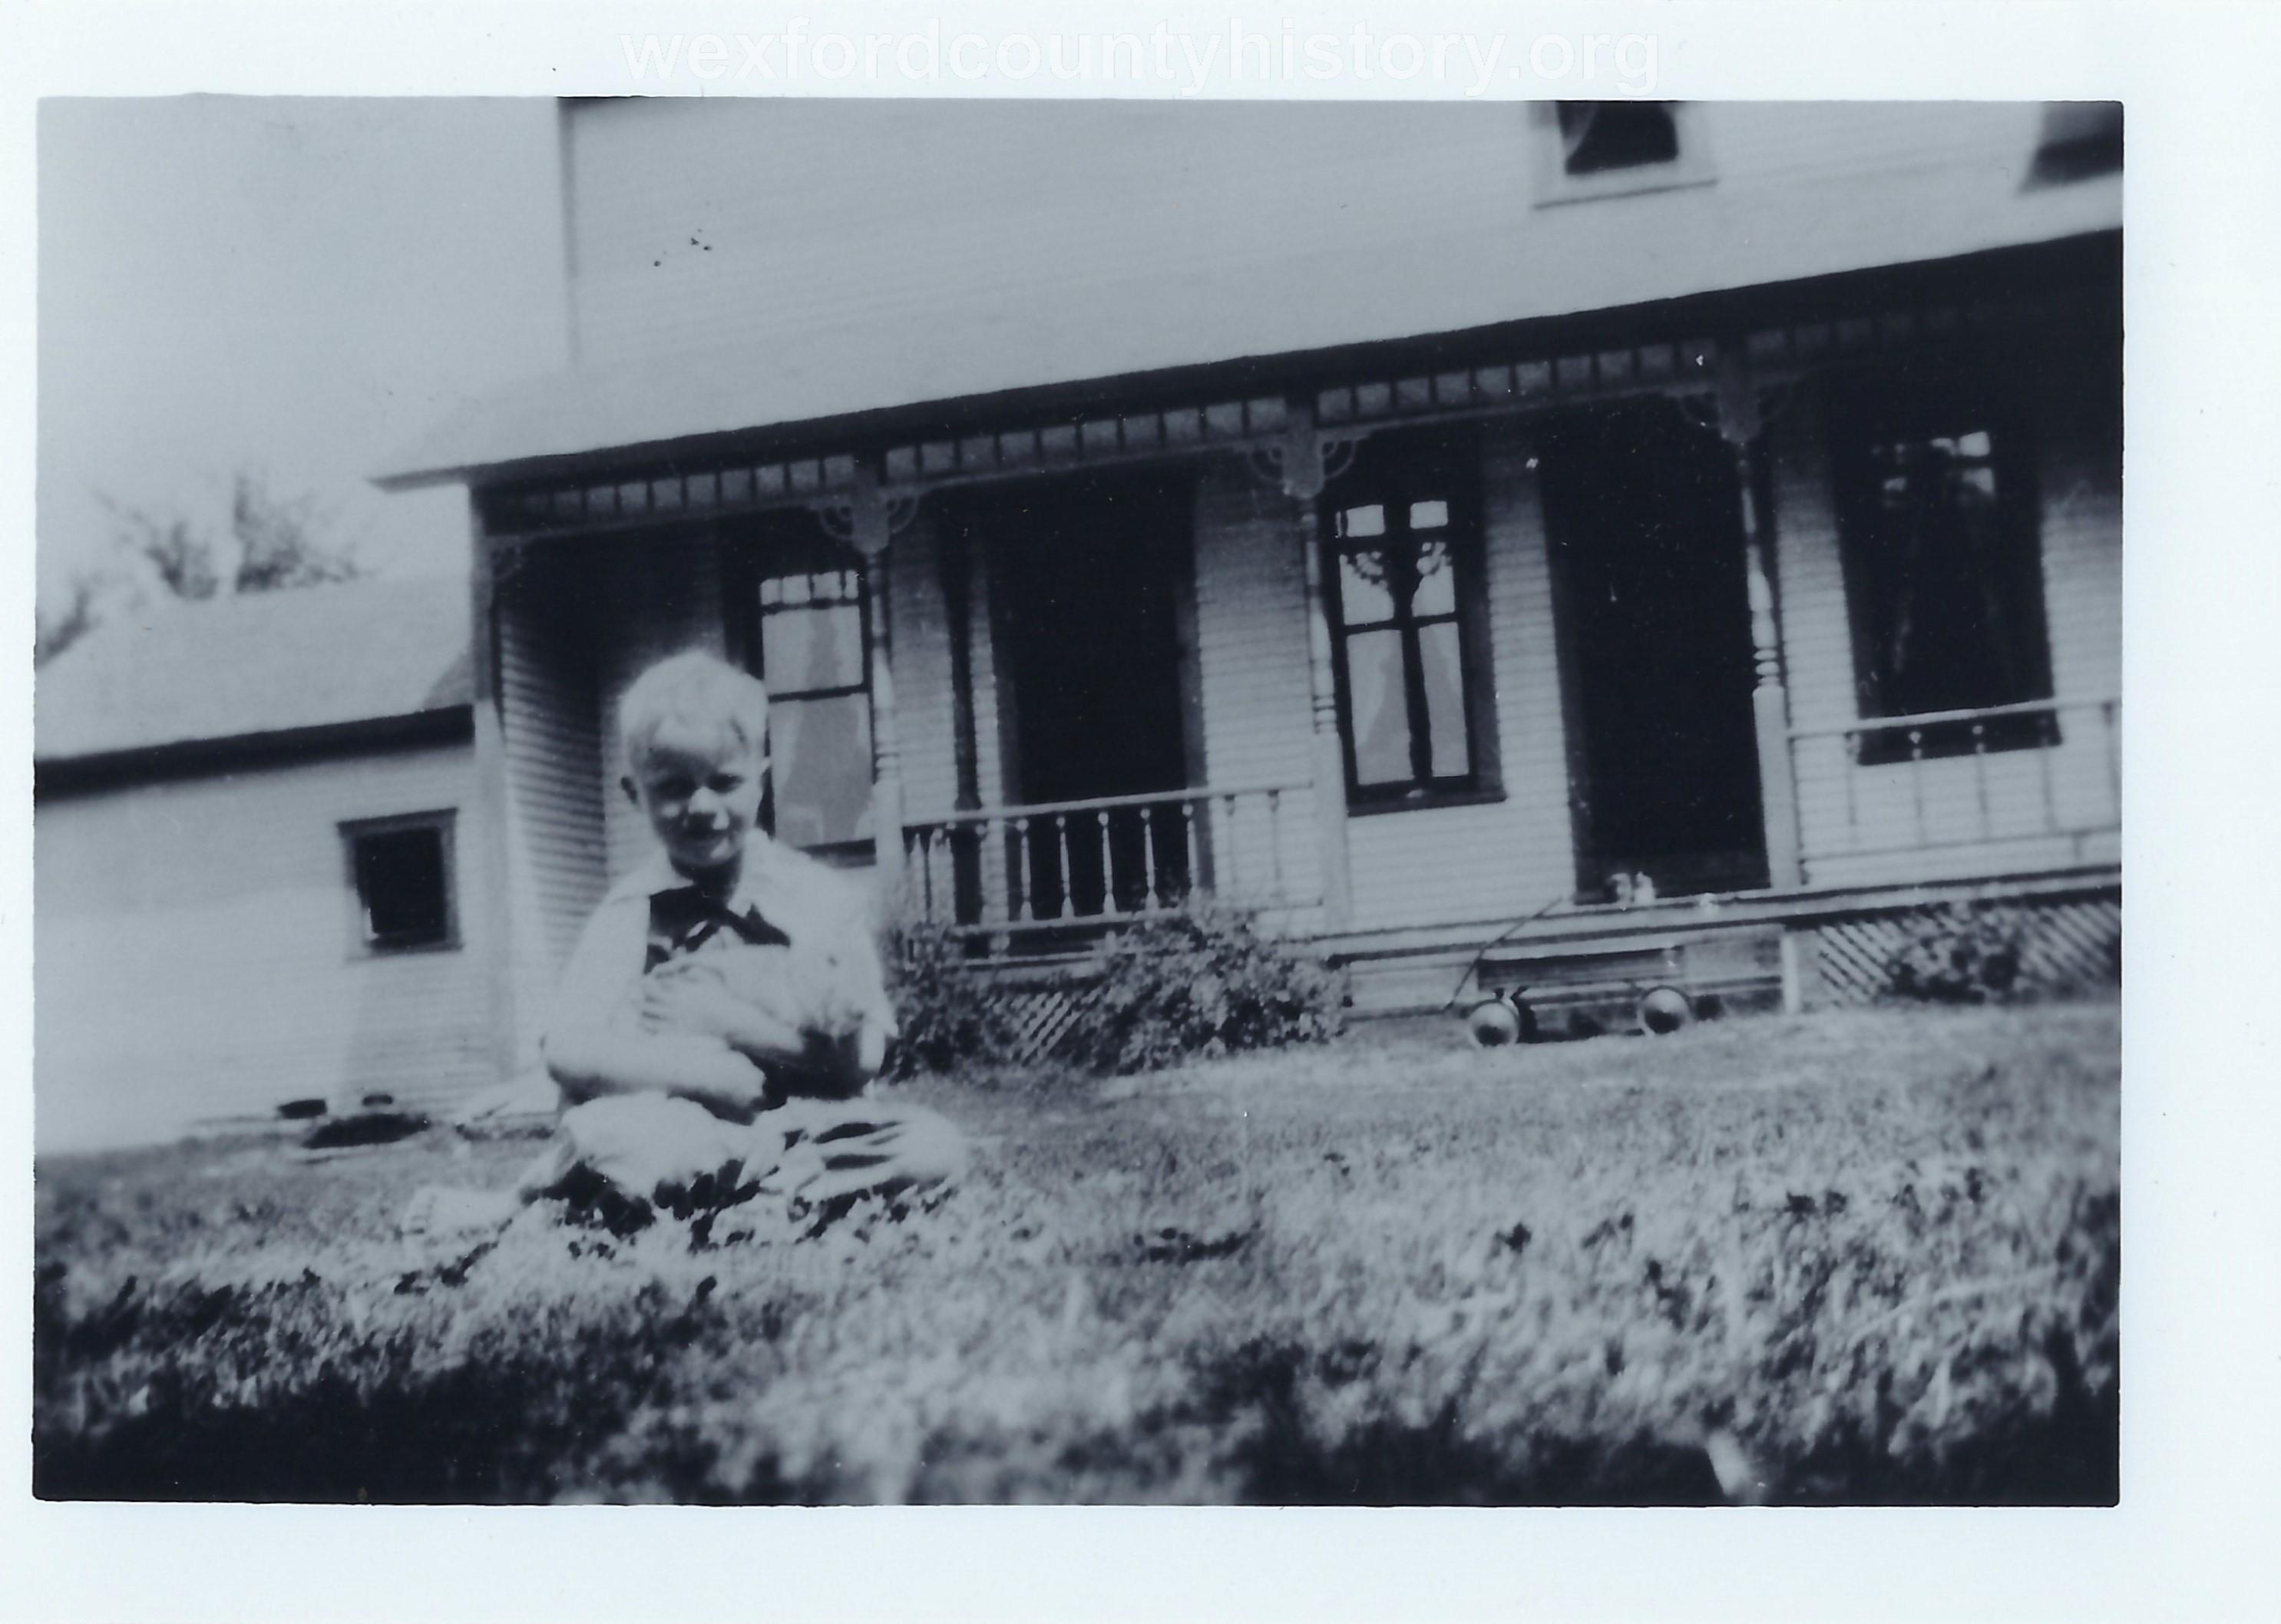 Lee Rock In 1933